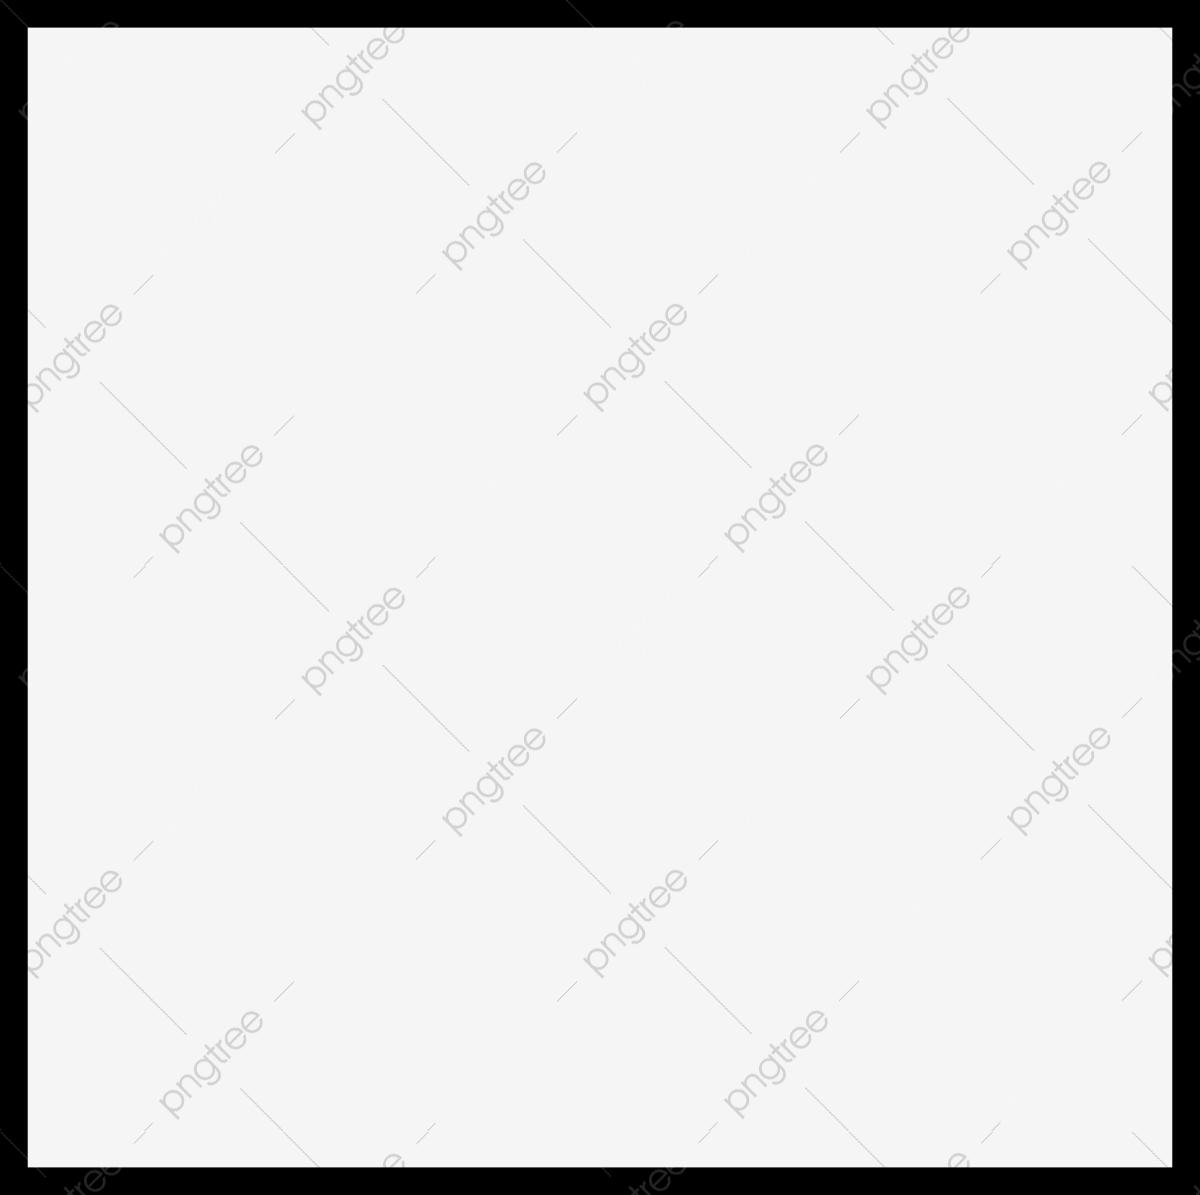 Black Border, Black, Simple, Frame PNG Transparent Image and Clipart.